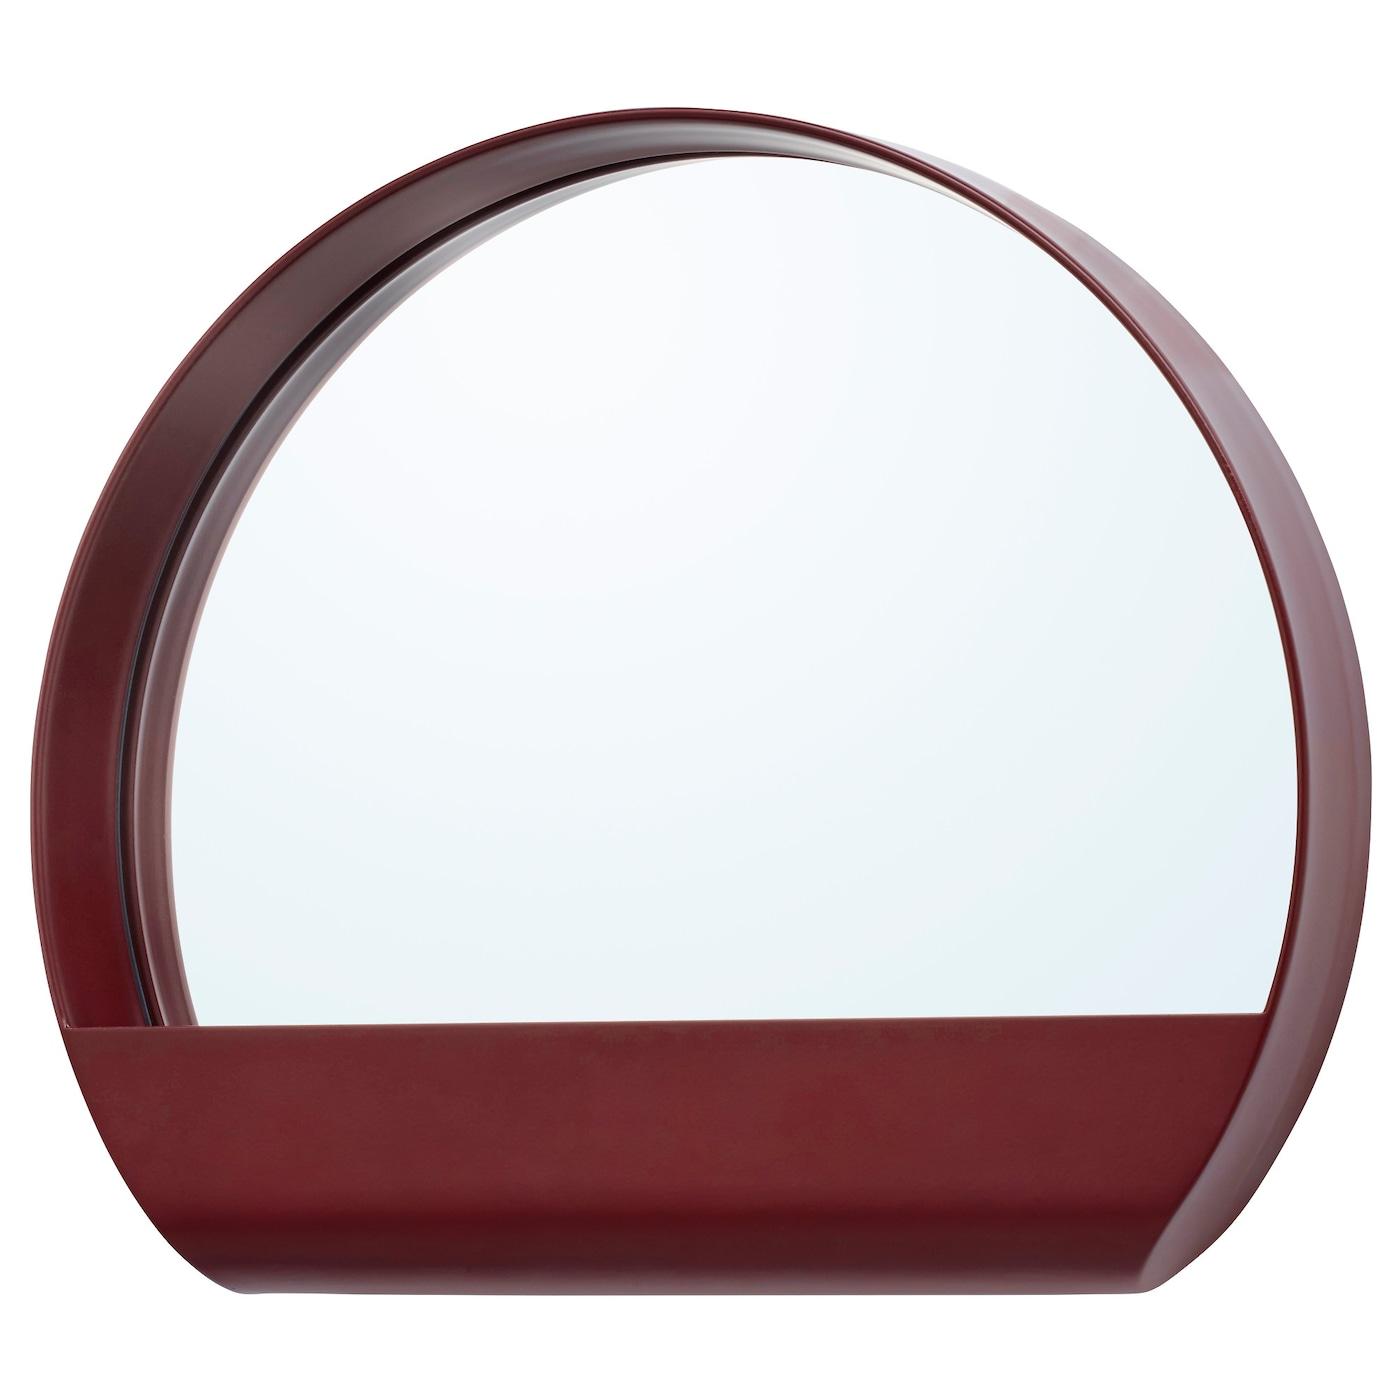 spiegels staande spiegel ikea. Black Bedroom Furniture Sets. Home Design Ideas